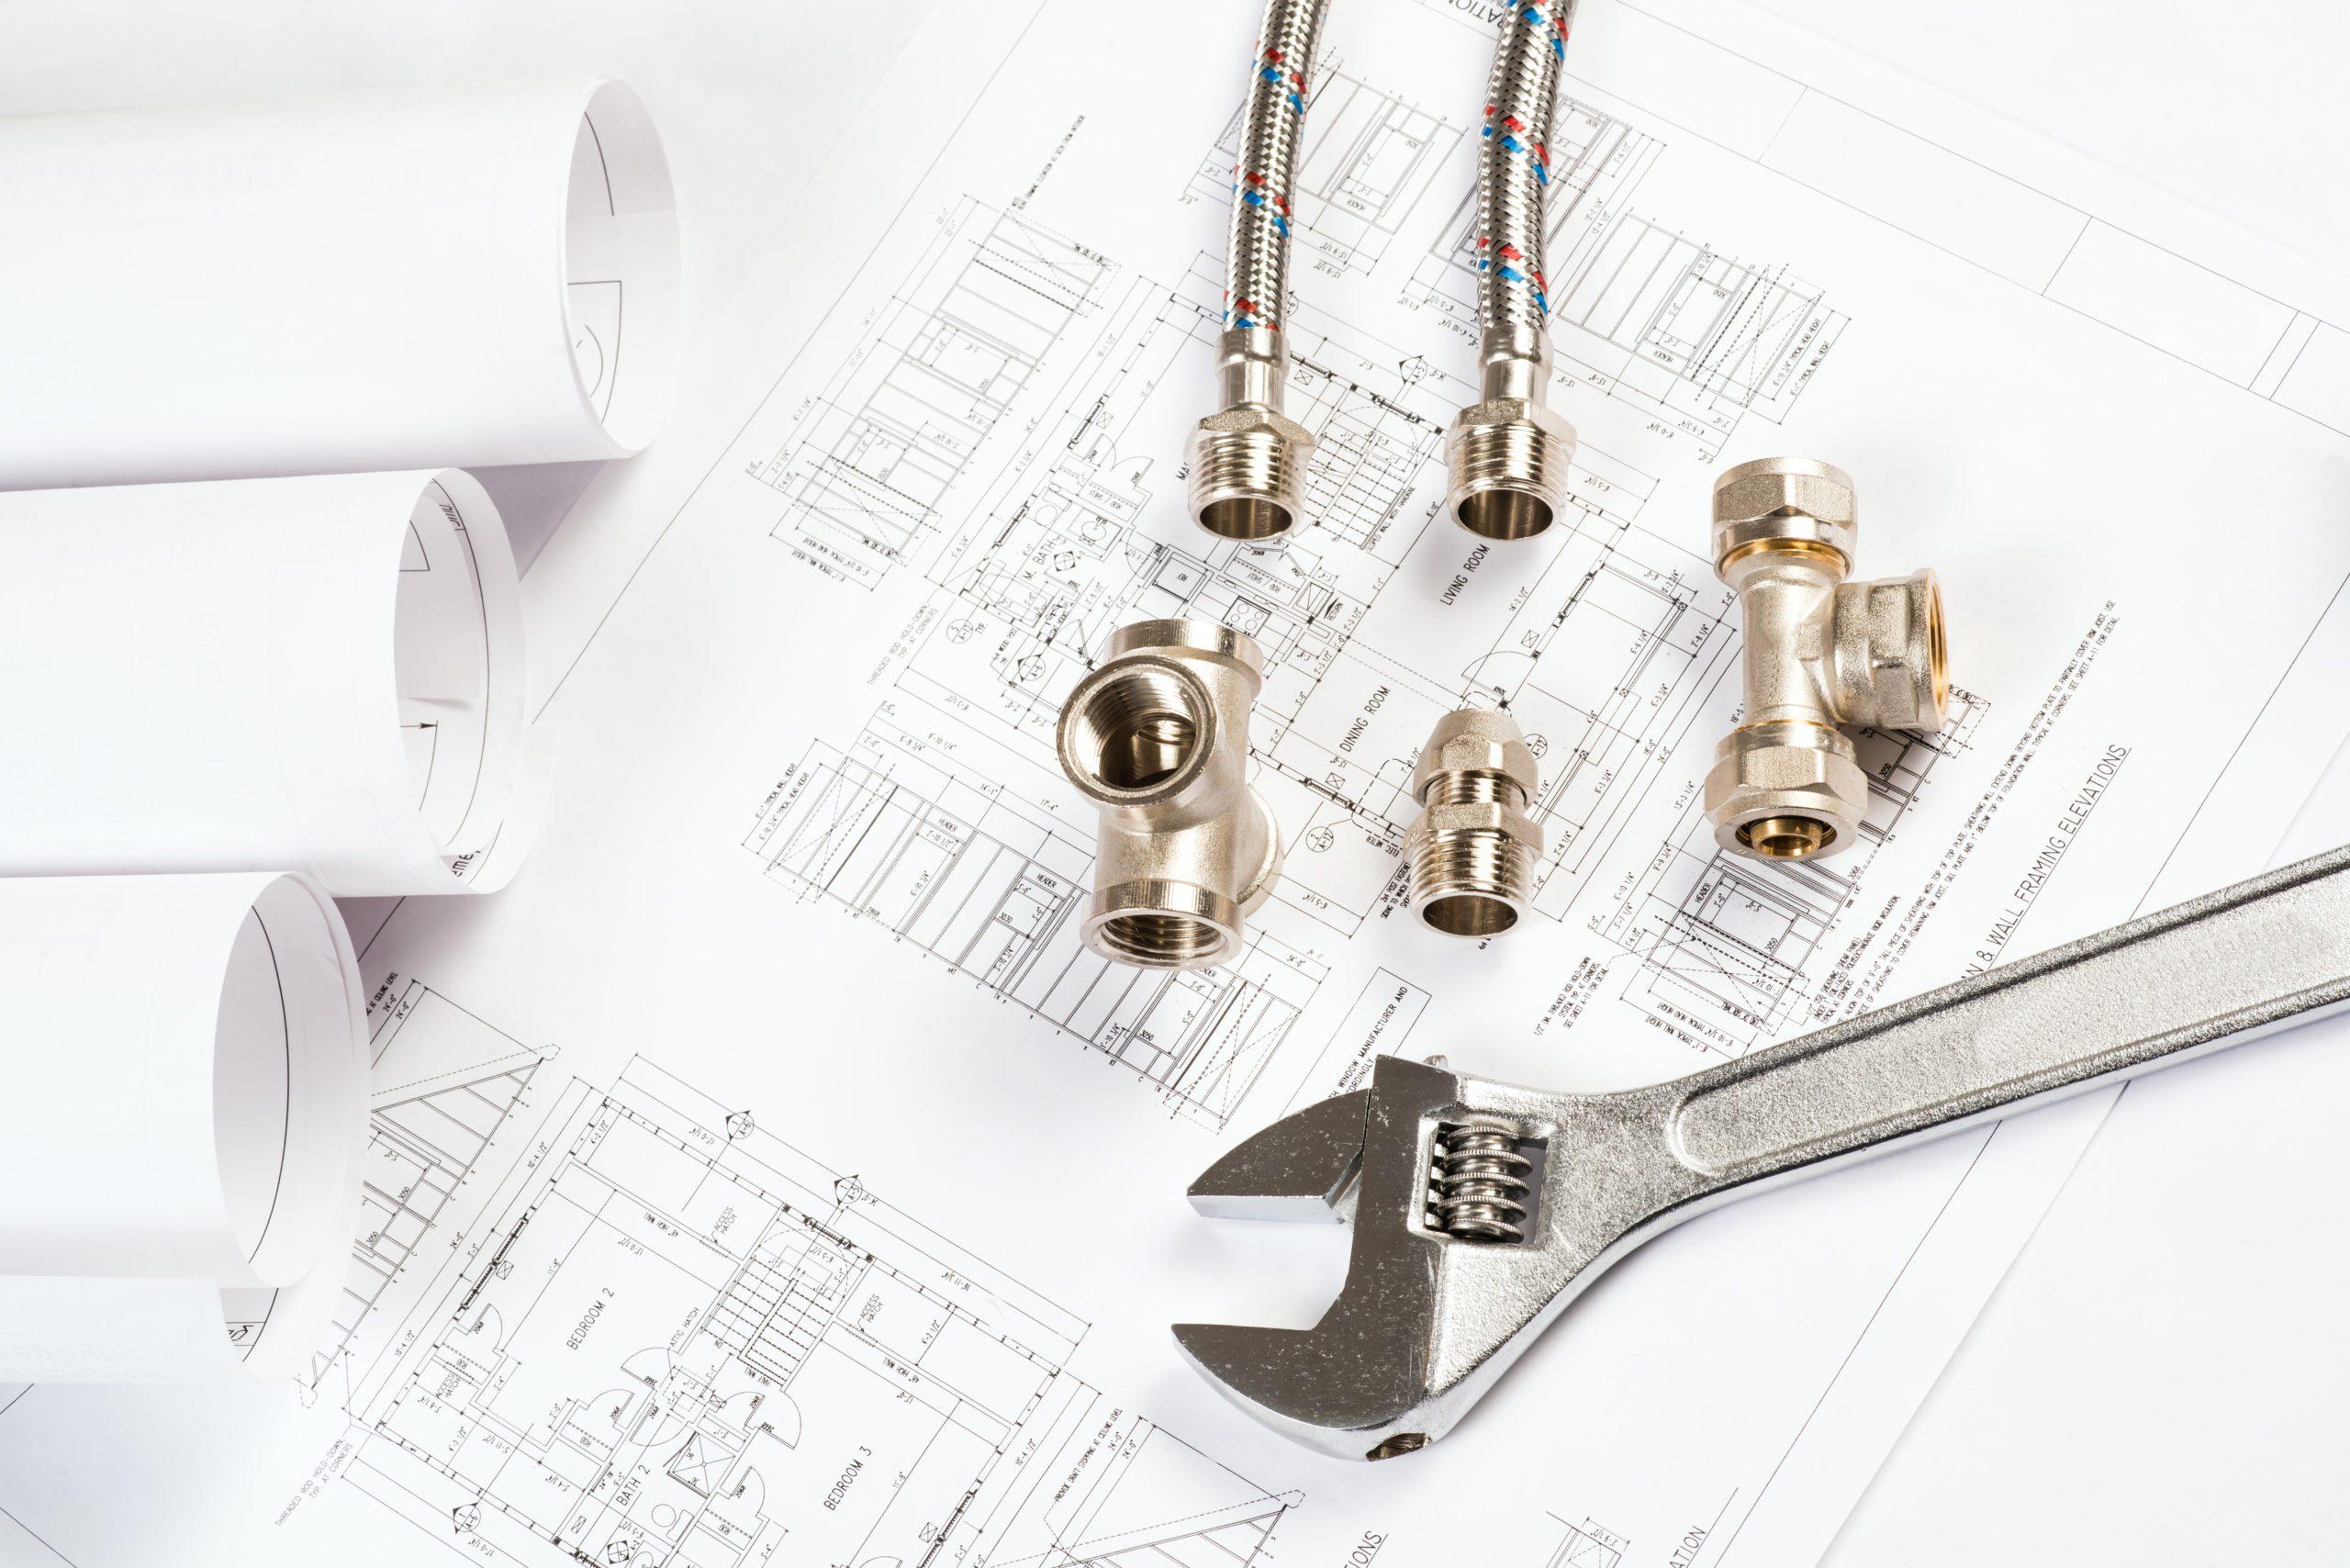 plumbing and drawings are on the desktop, workspace engineer